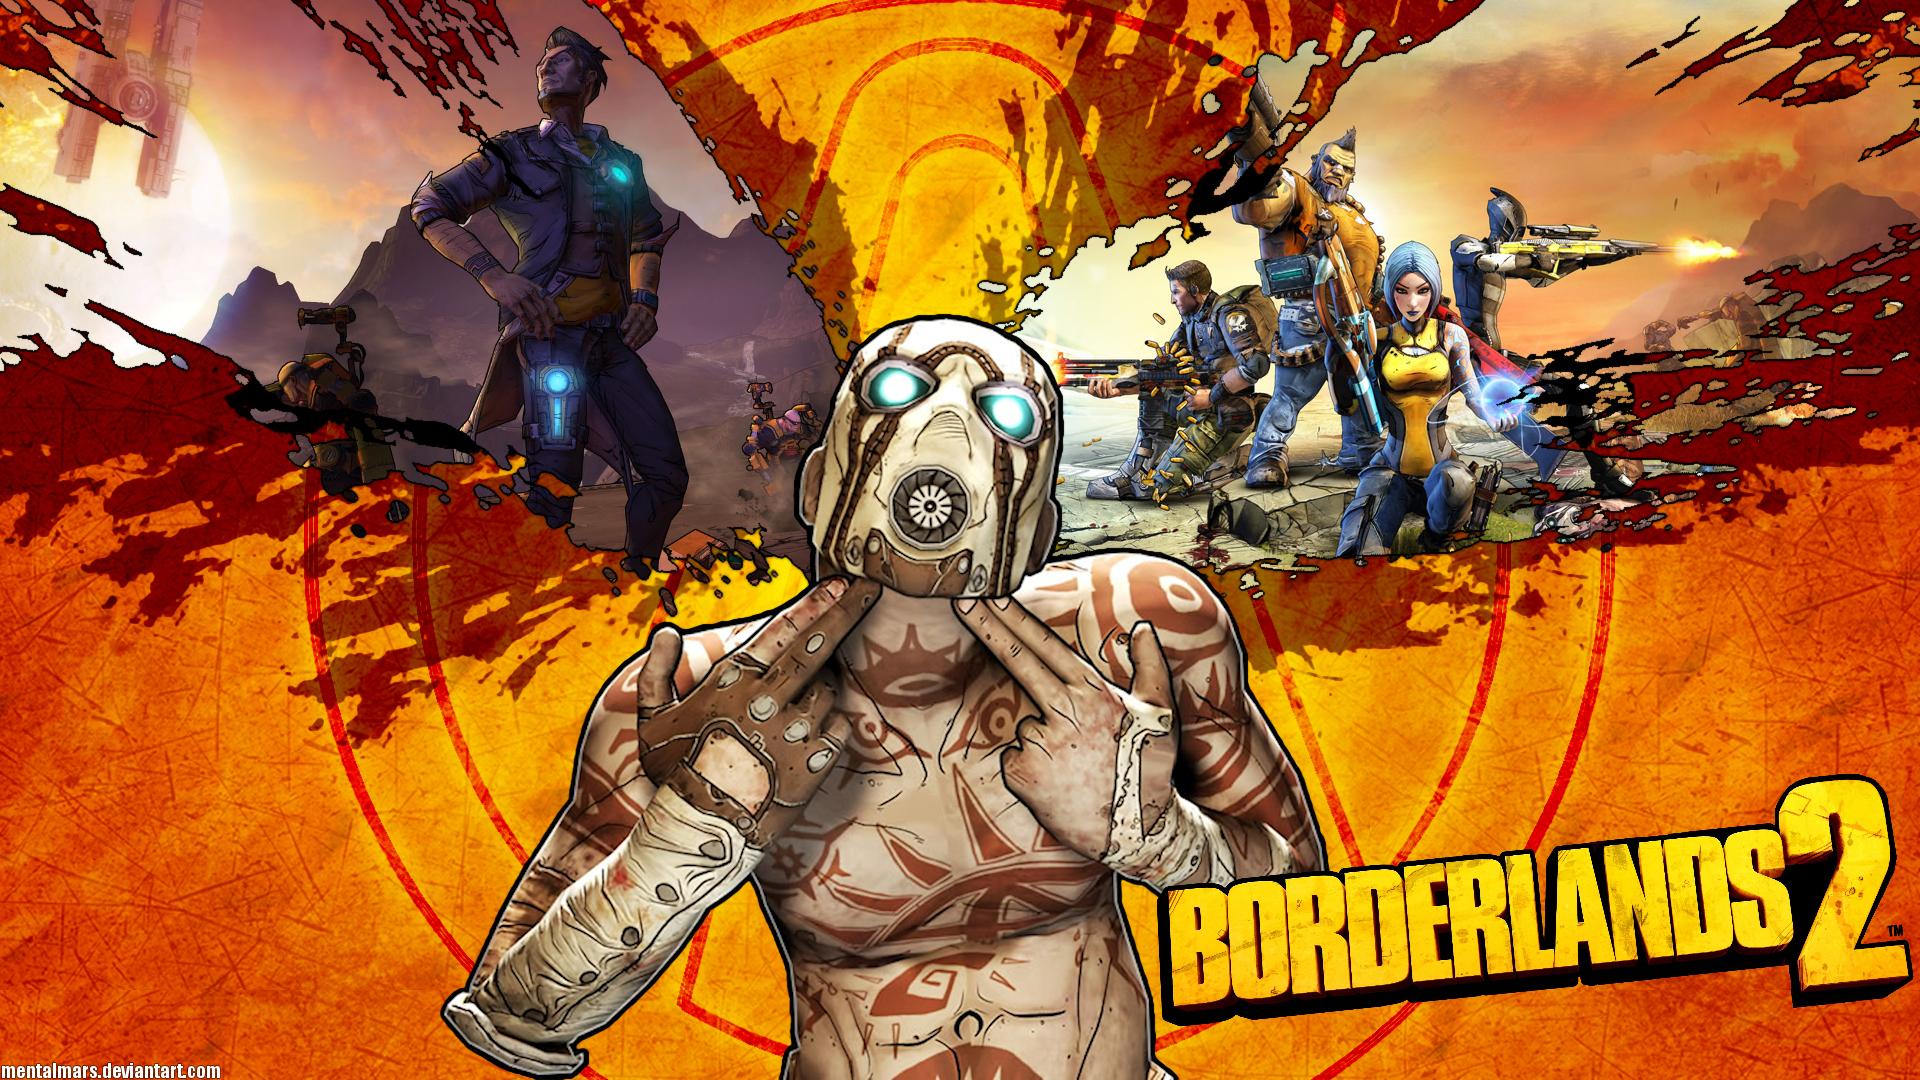 Large Borderlands 2 Game Wallpapers ...